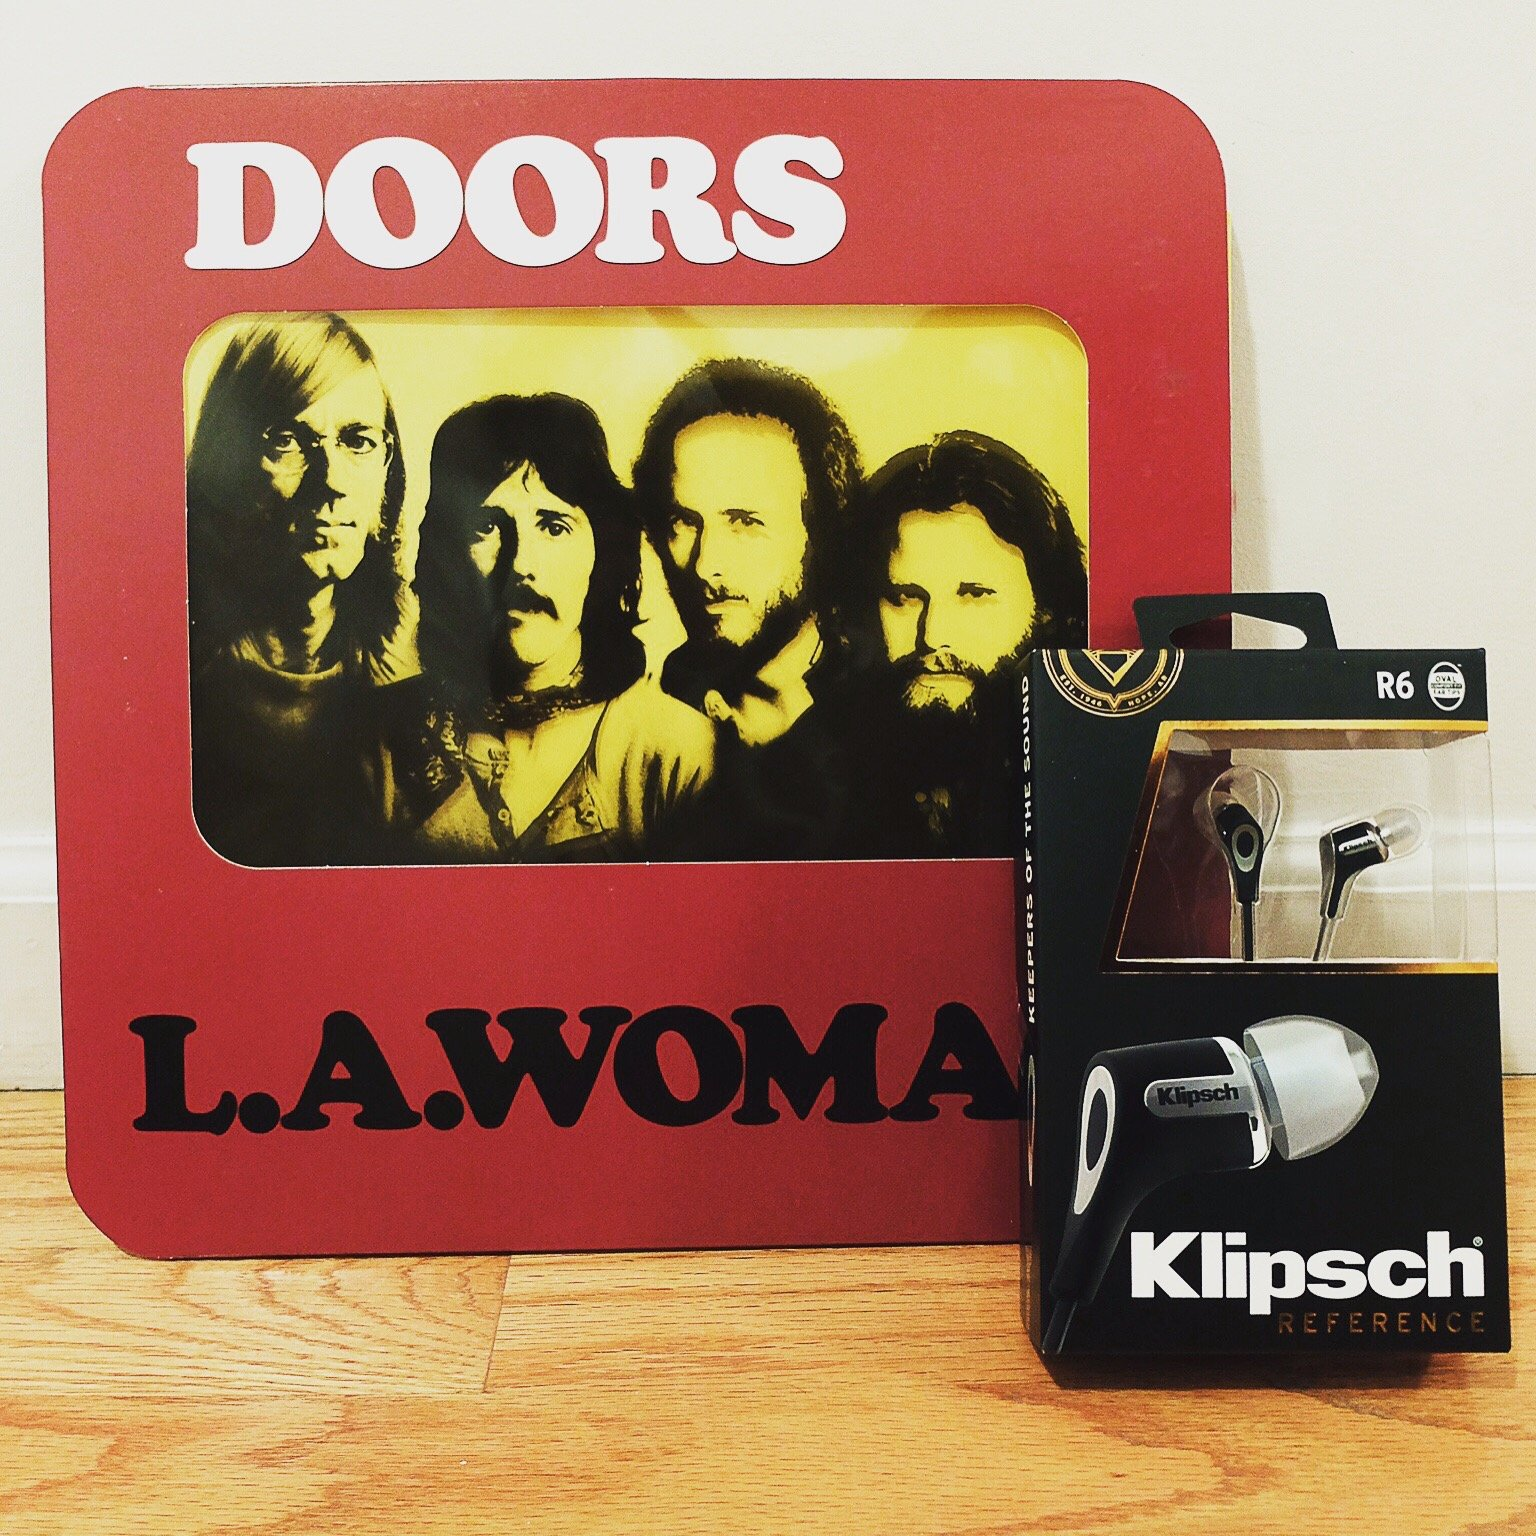 The Doors L A  Woman & Klipsch Audio R6 earphones